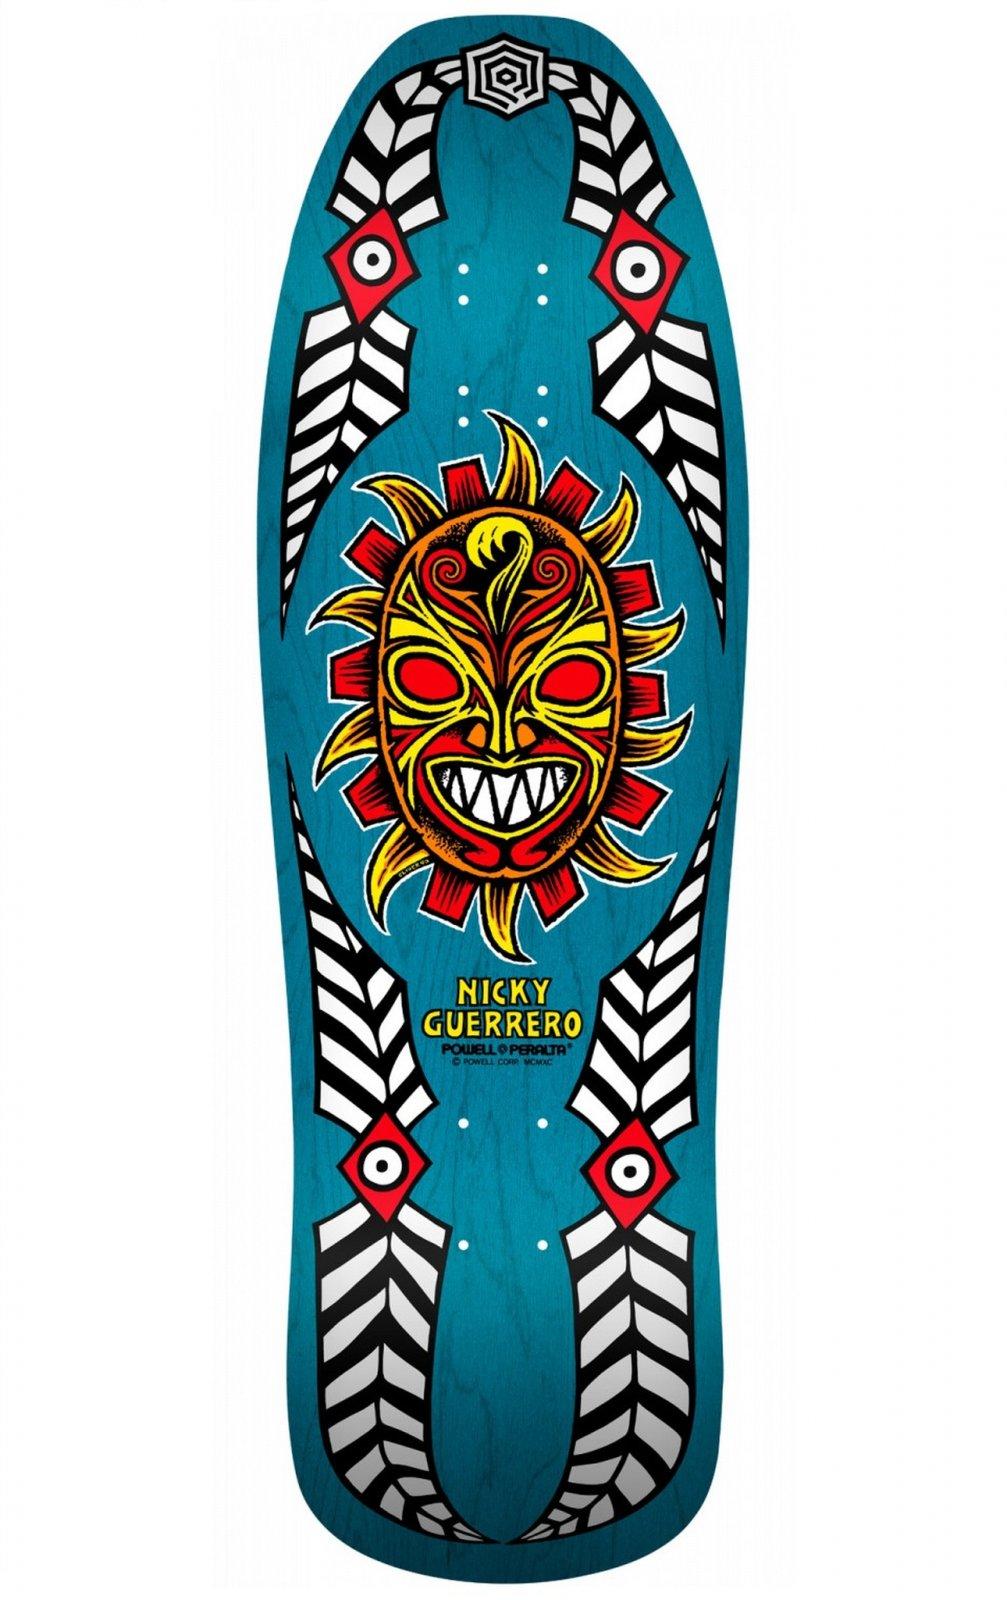 Powell Peralta Nicky Guerrero Mask 10.0 x 31.75 Skateboard Deck